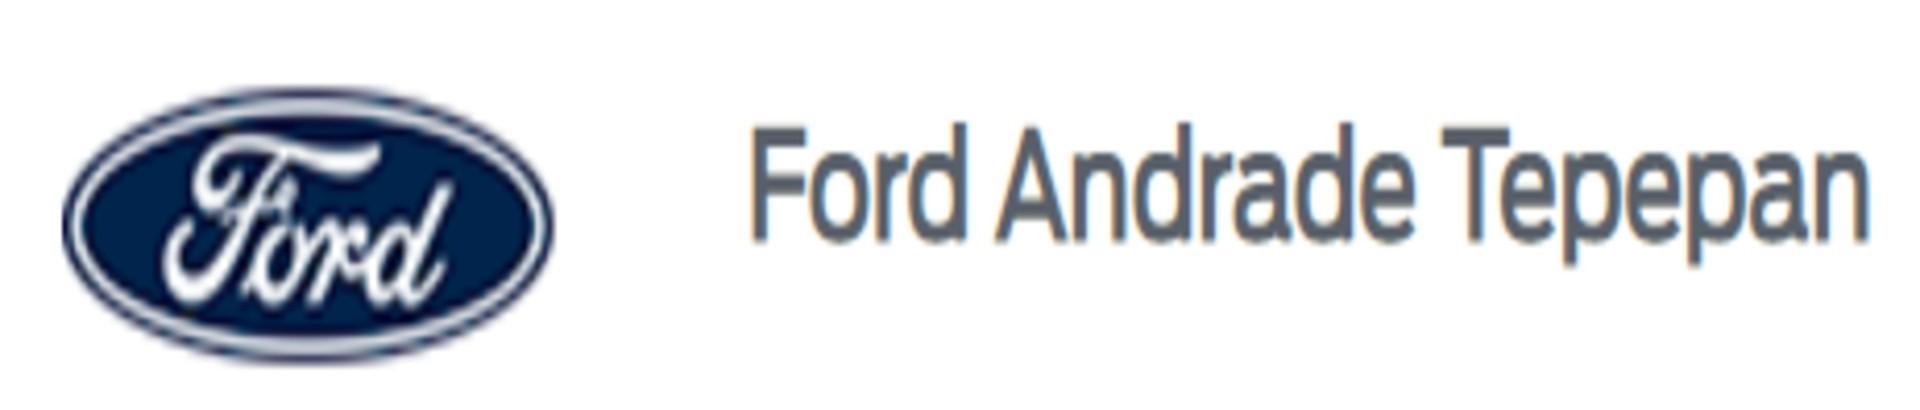 Ford Andrade Tepepan